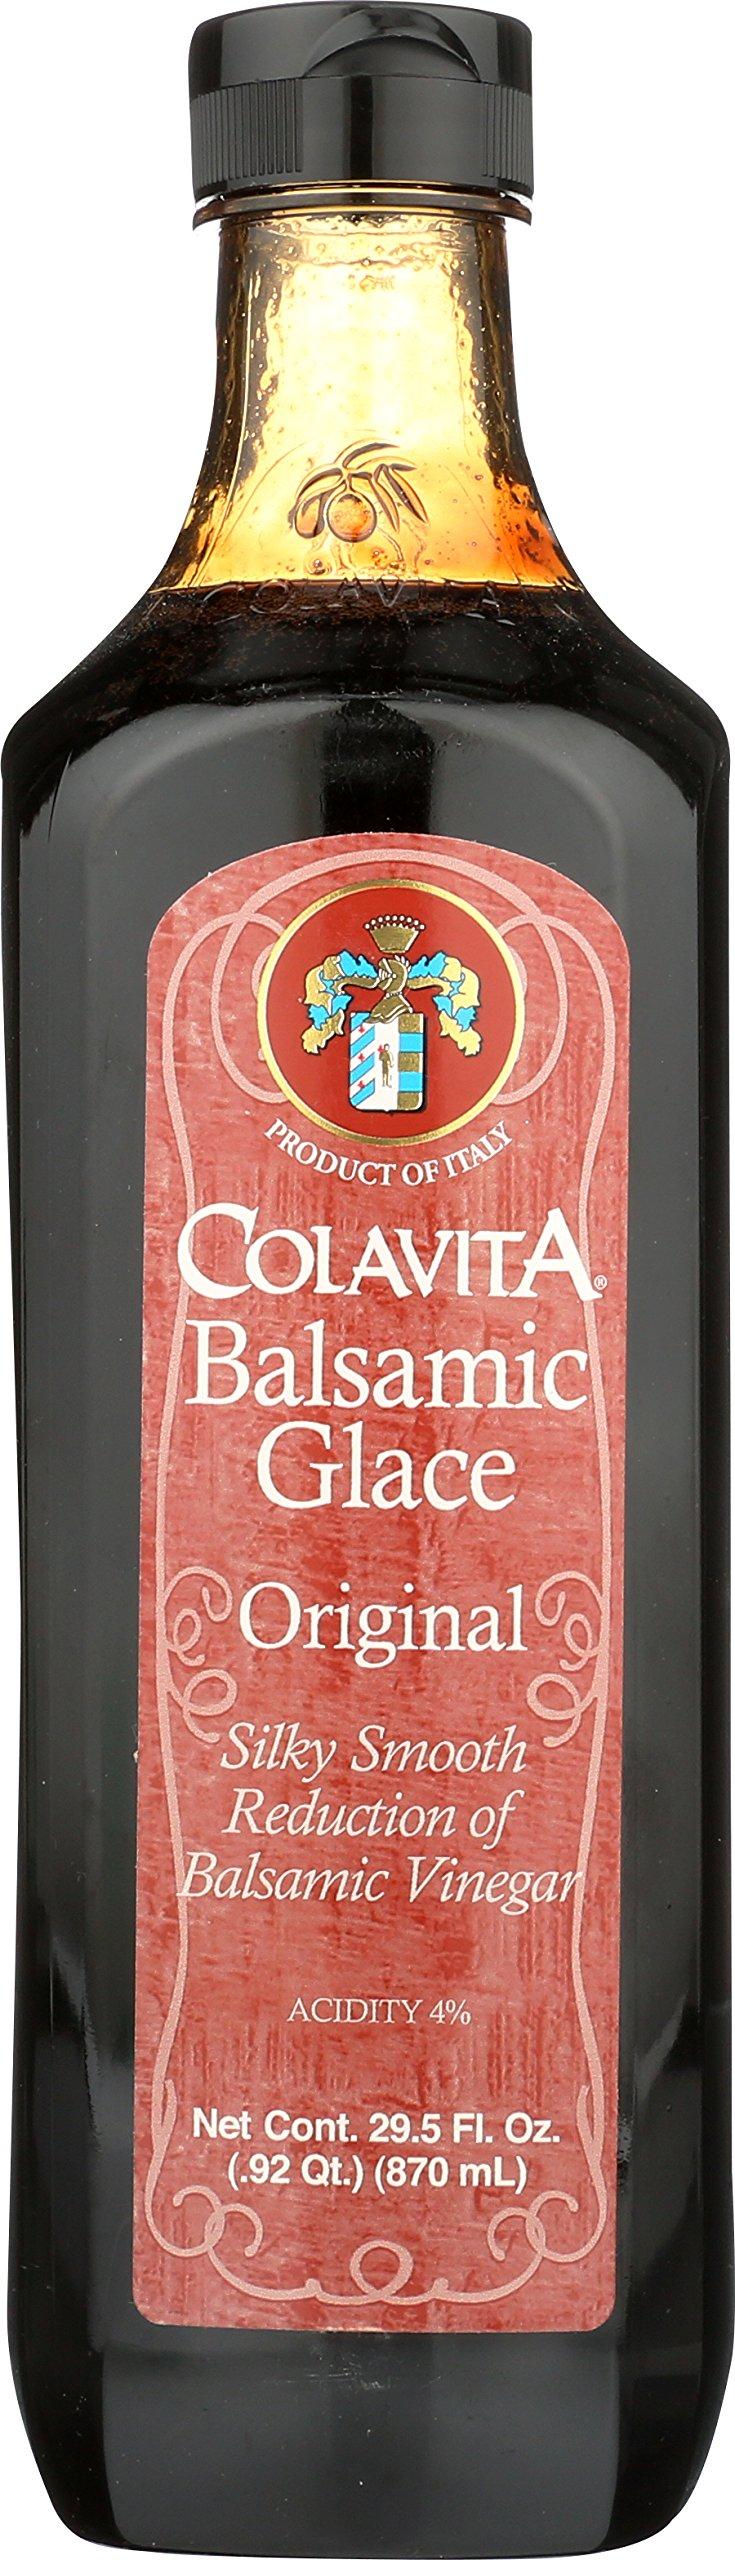 Colavita Balsamic Glace (Glaze), 29.5 Ounce